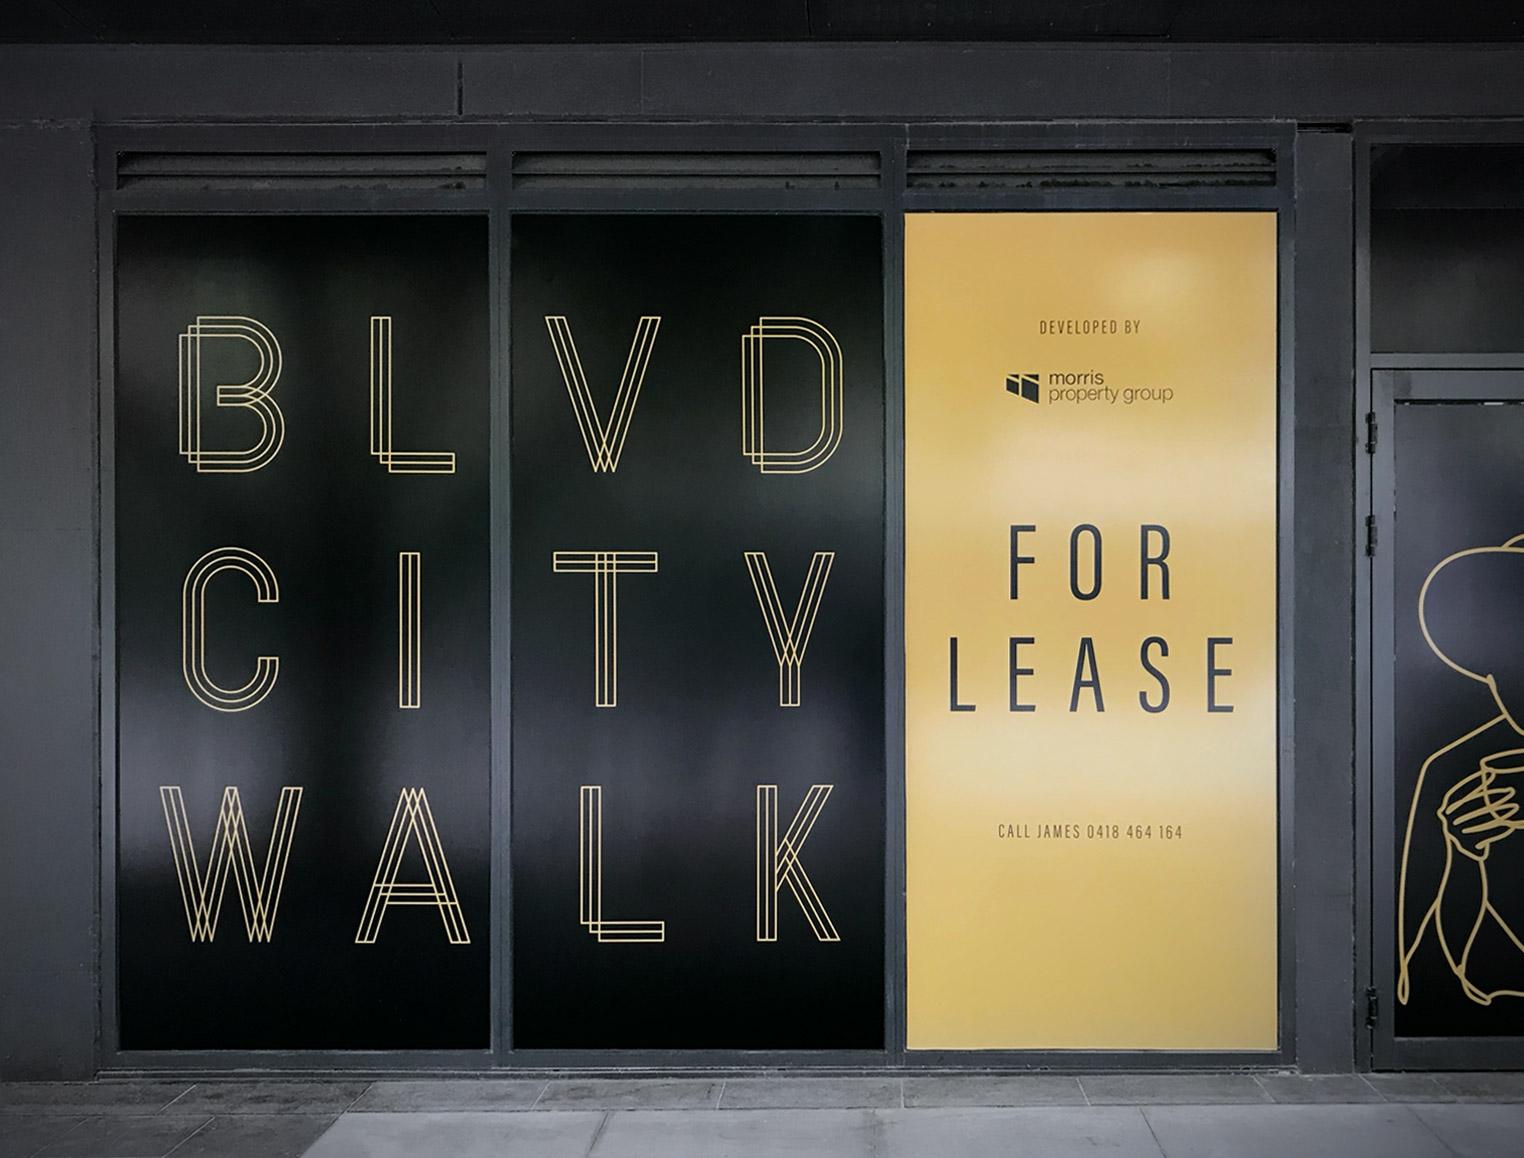 BLVD tile image